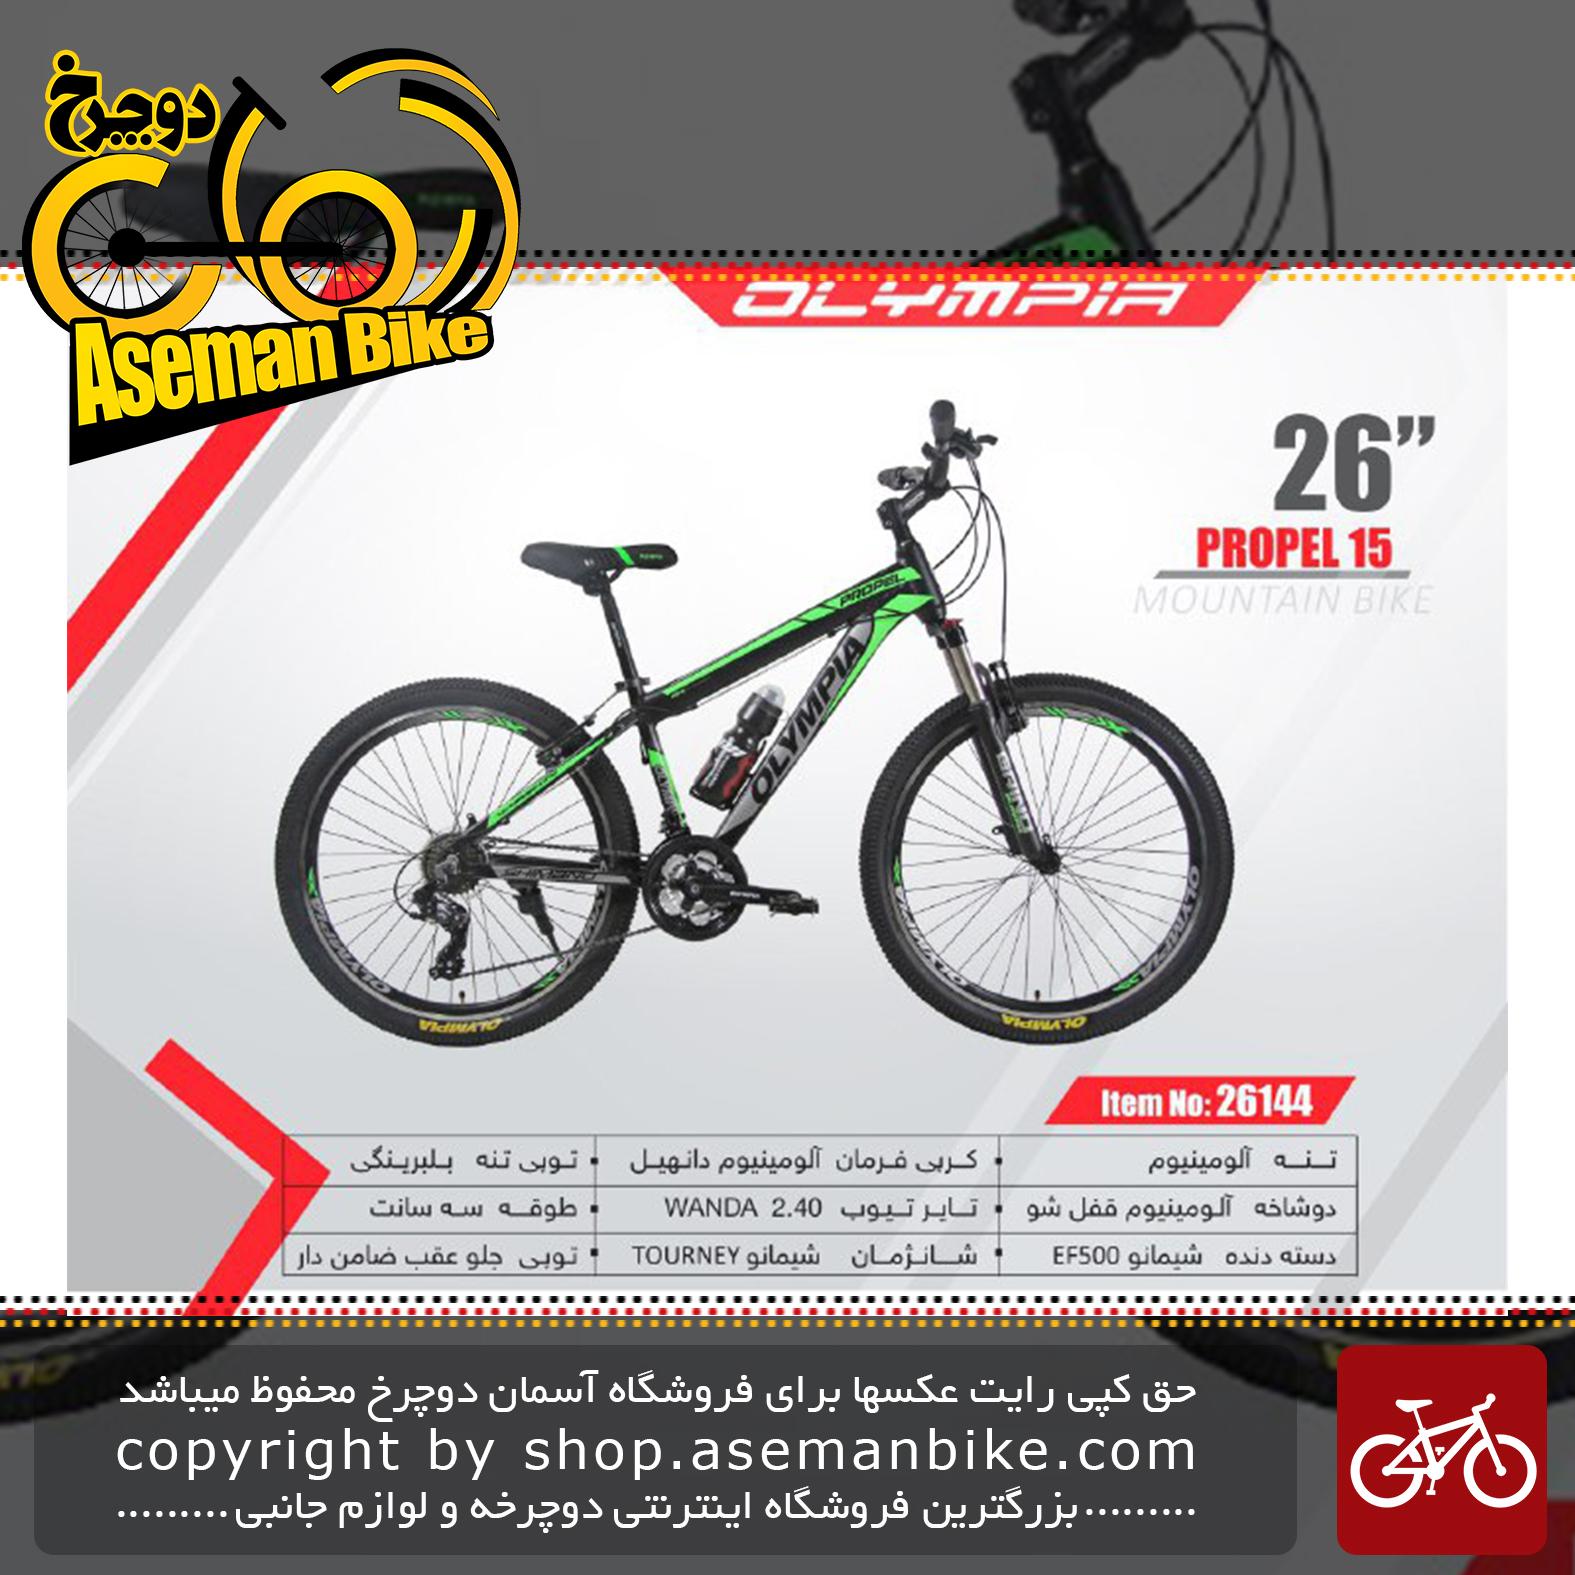 دوچرخه کوهستان المپیا سایز26 مدل پروپلOLYMPIA SIZE 26 PROPEL